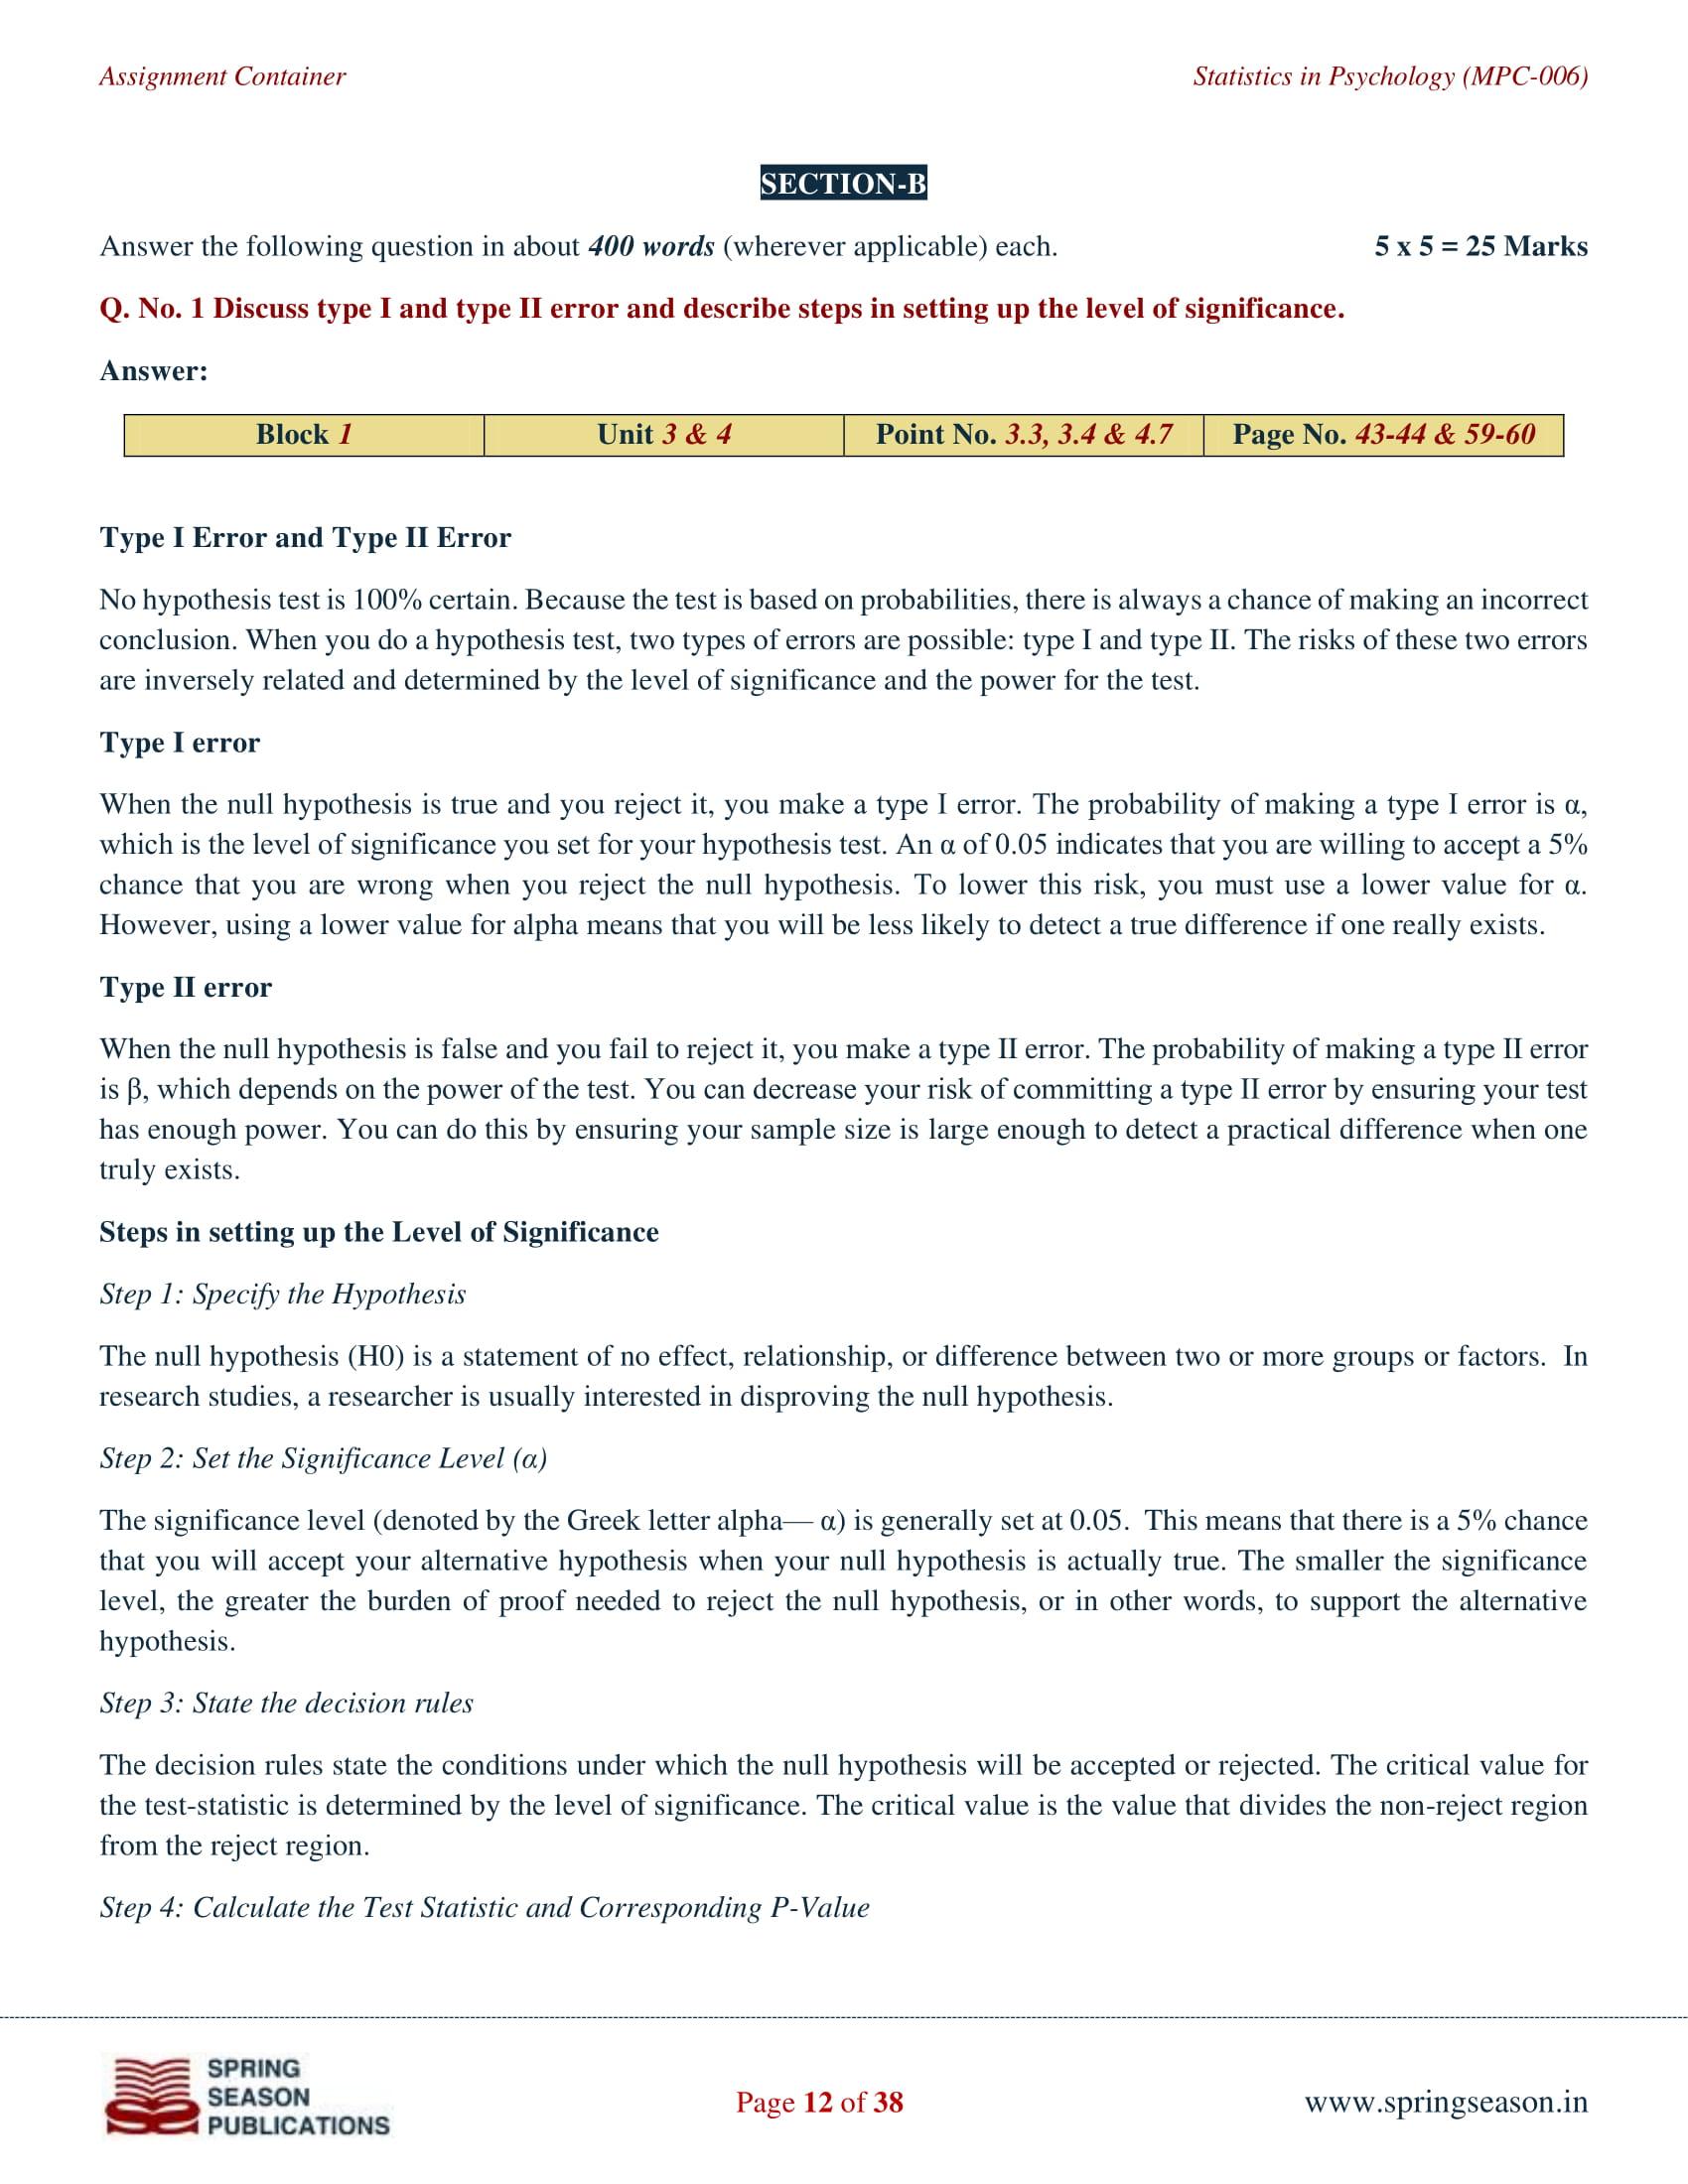 summarize in essay diwali 10 lines